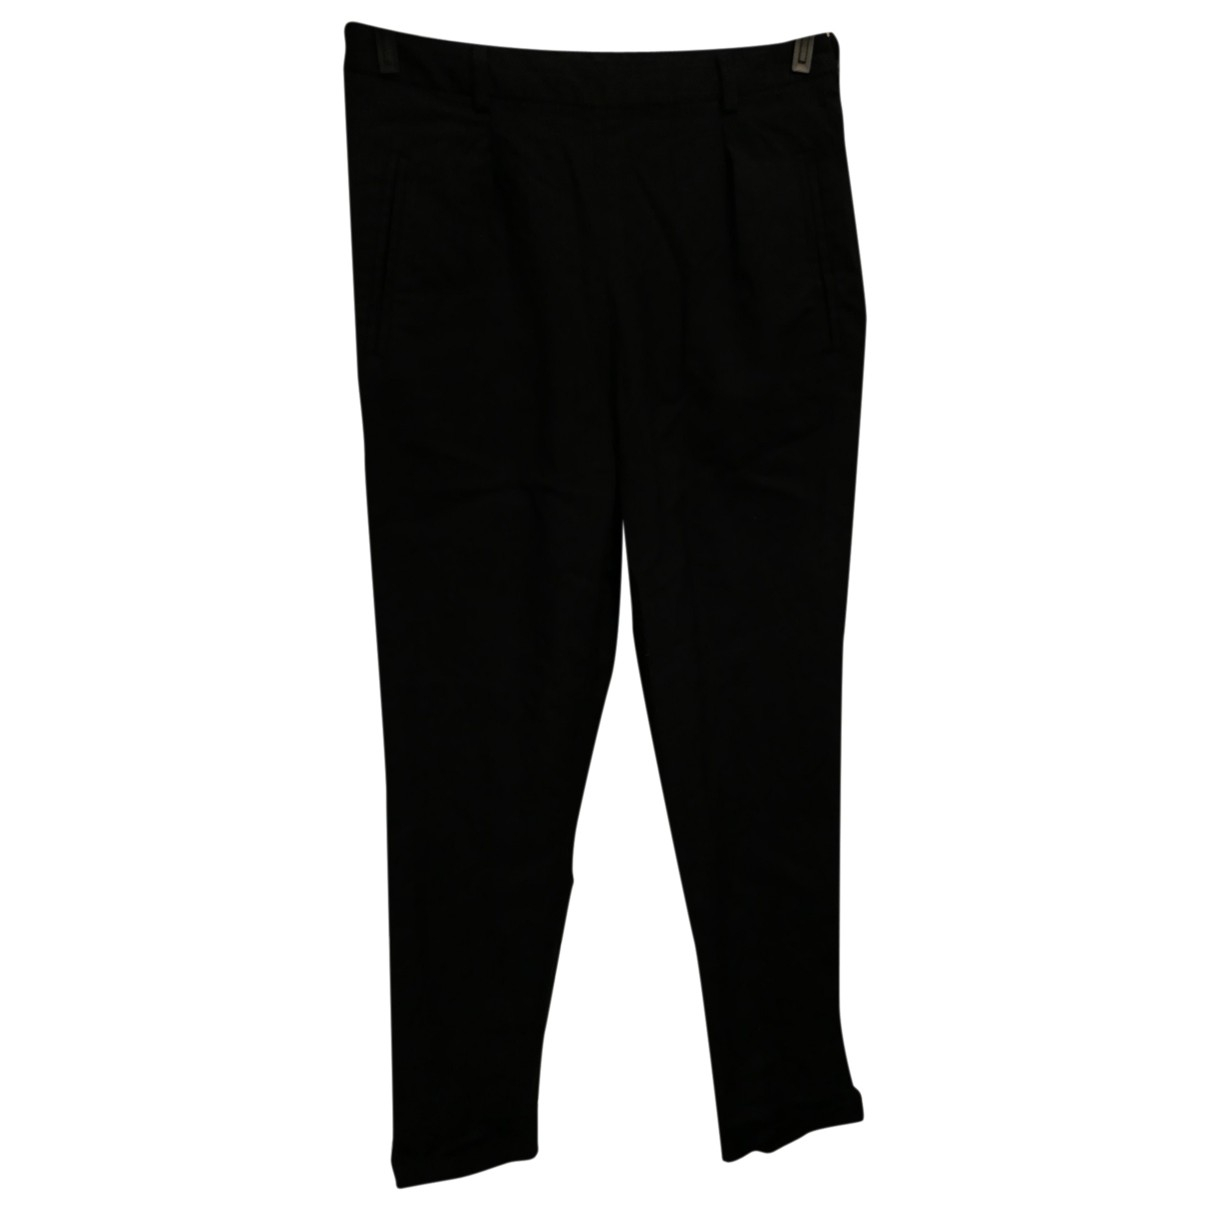 Apc \N Black Trousers for Women 34 FR